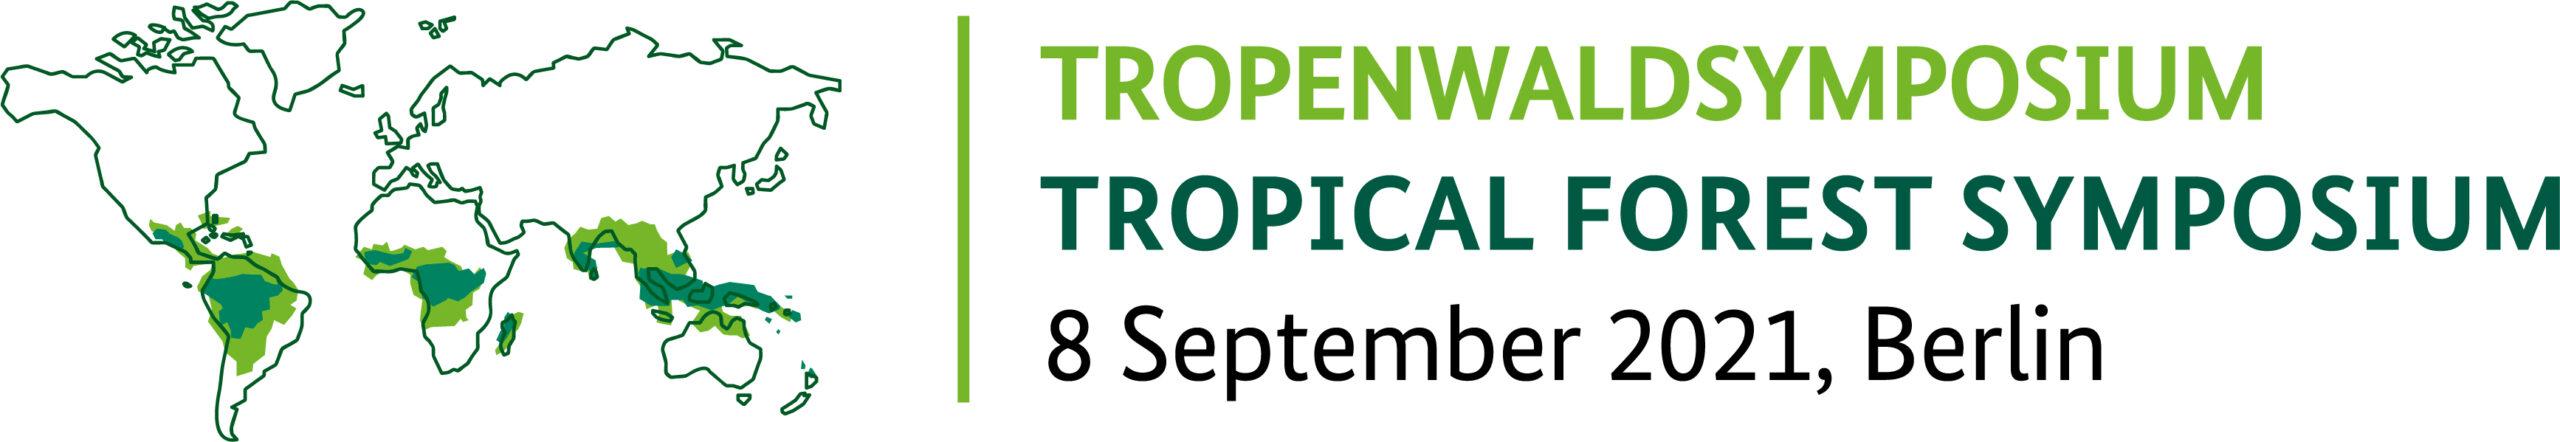 Tropenwald Symposium Logo